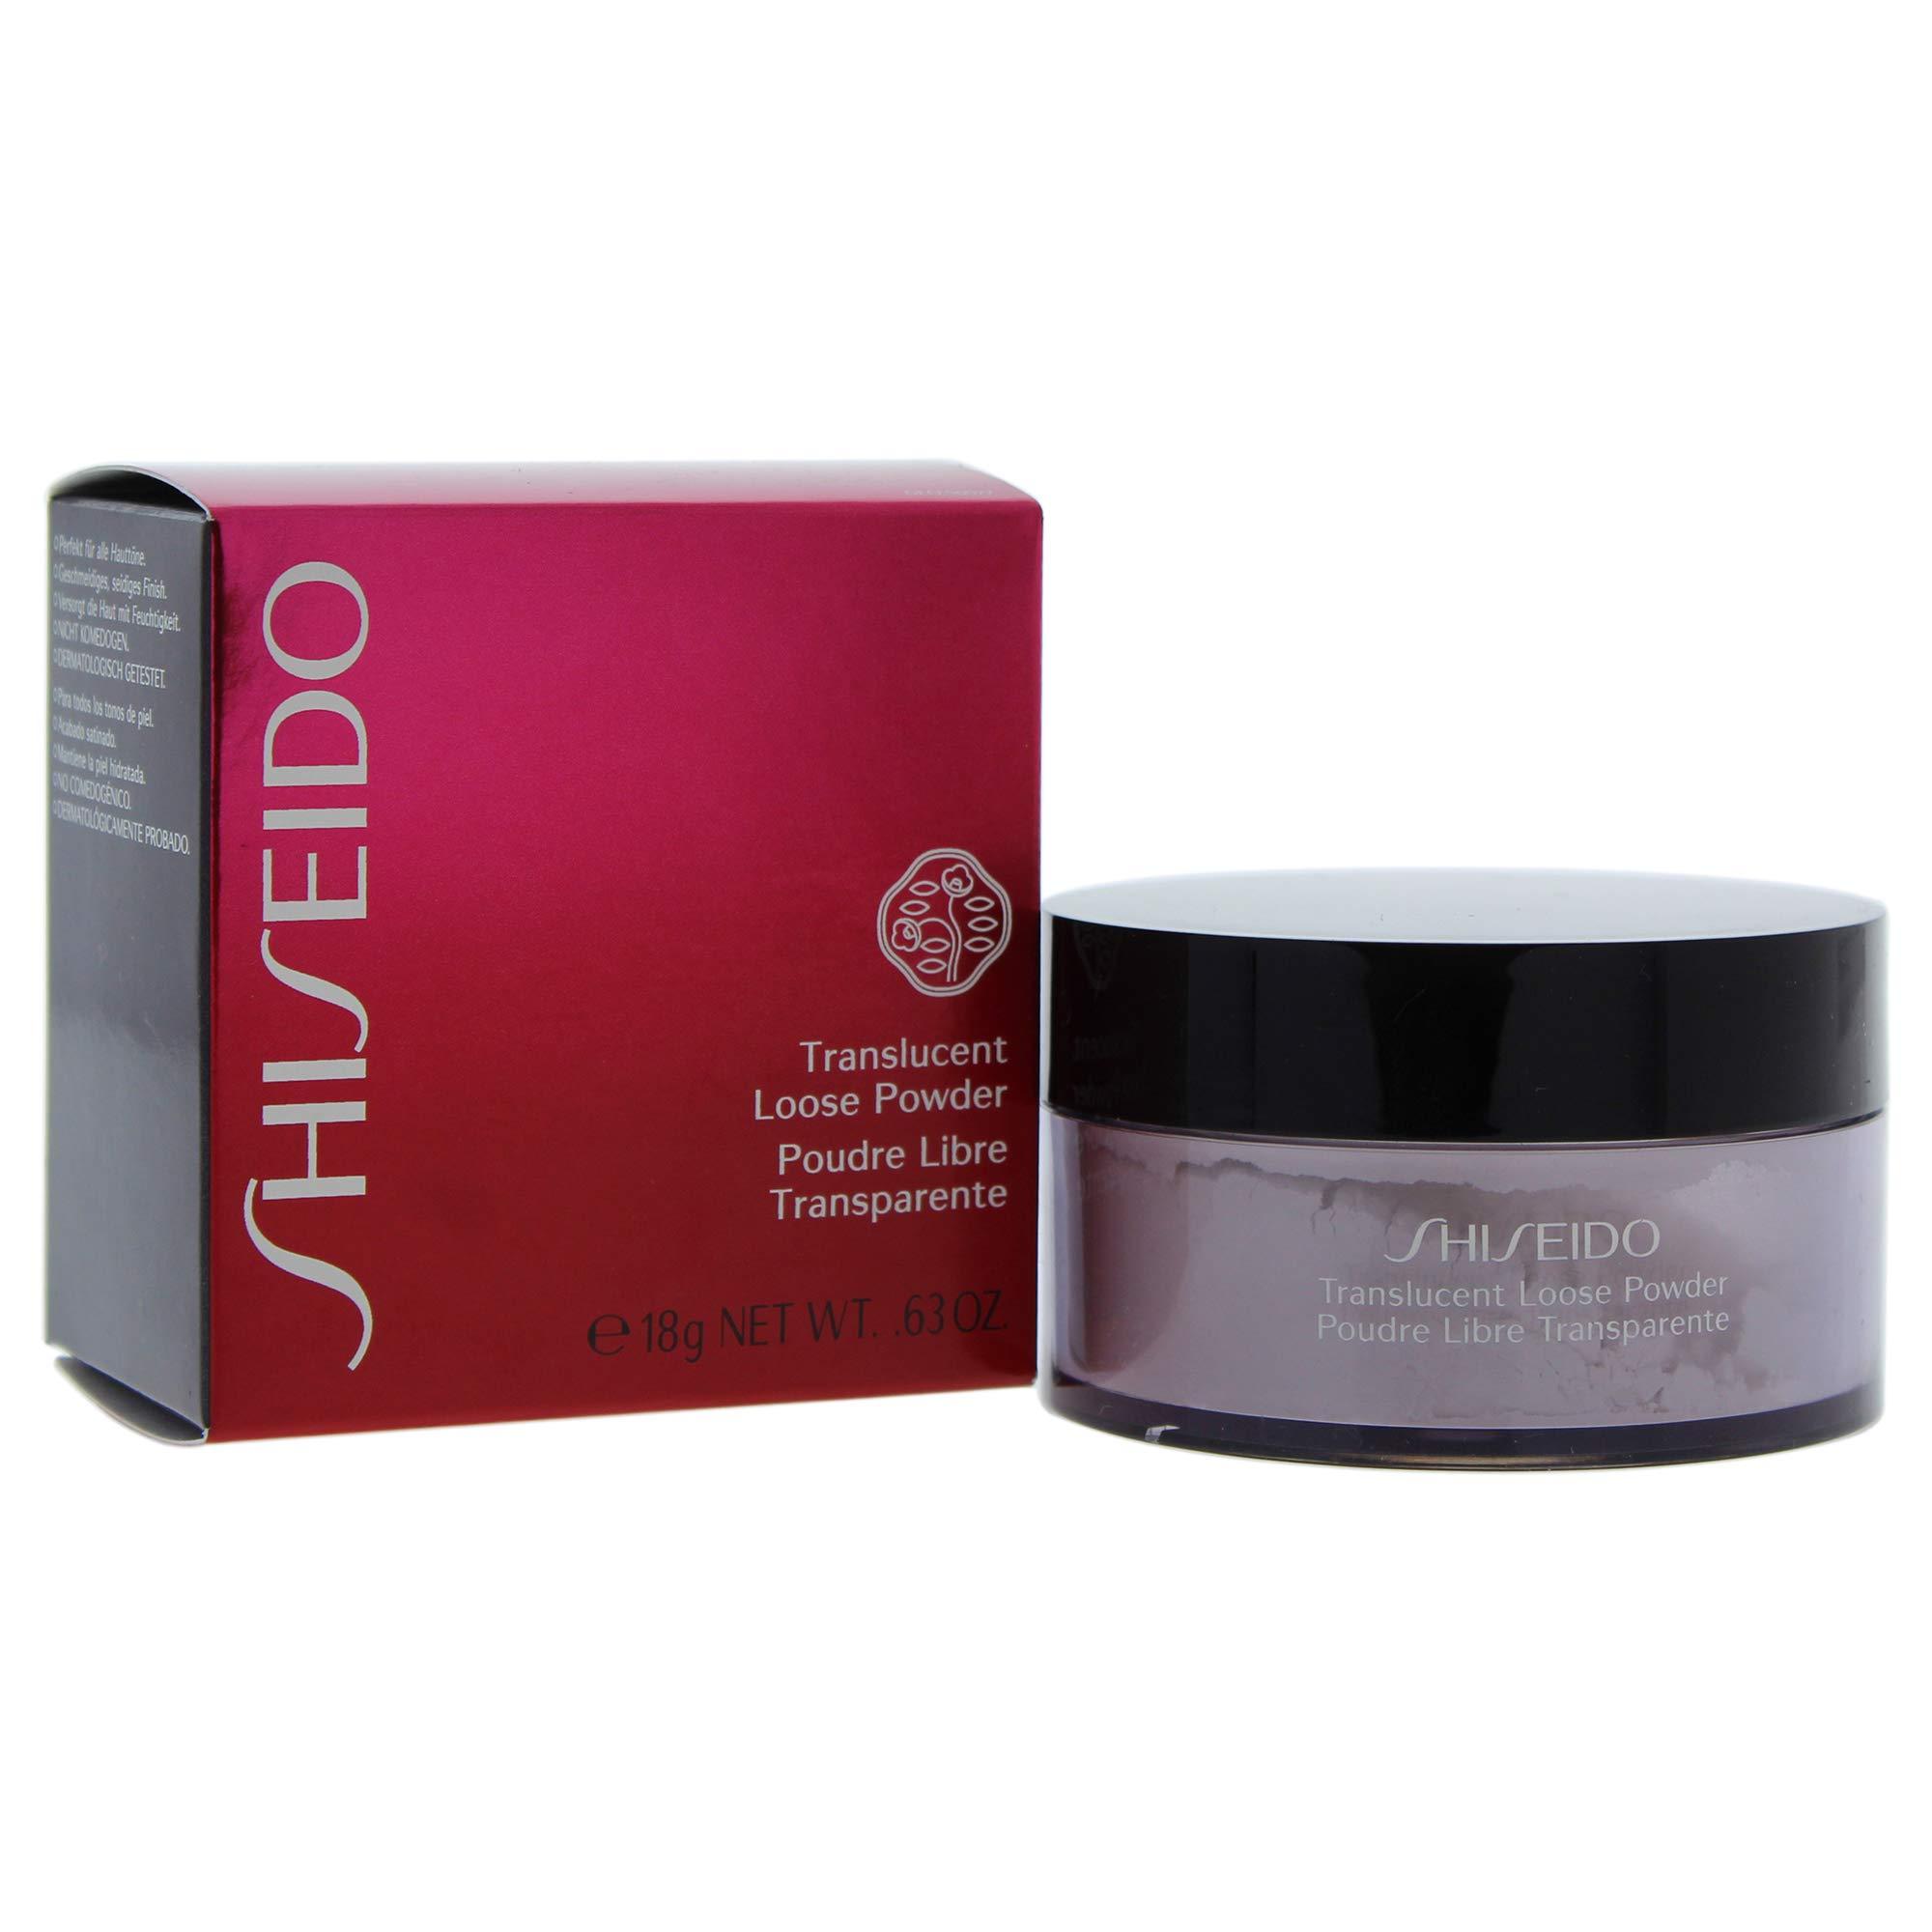 Shiseido Translucent Loose Powder By Shiseido for Women - 0.63 Oz Powder, 0.63 Oz